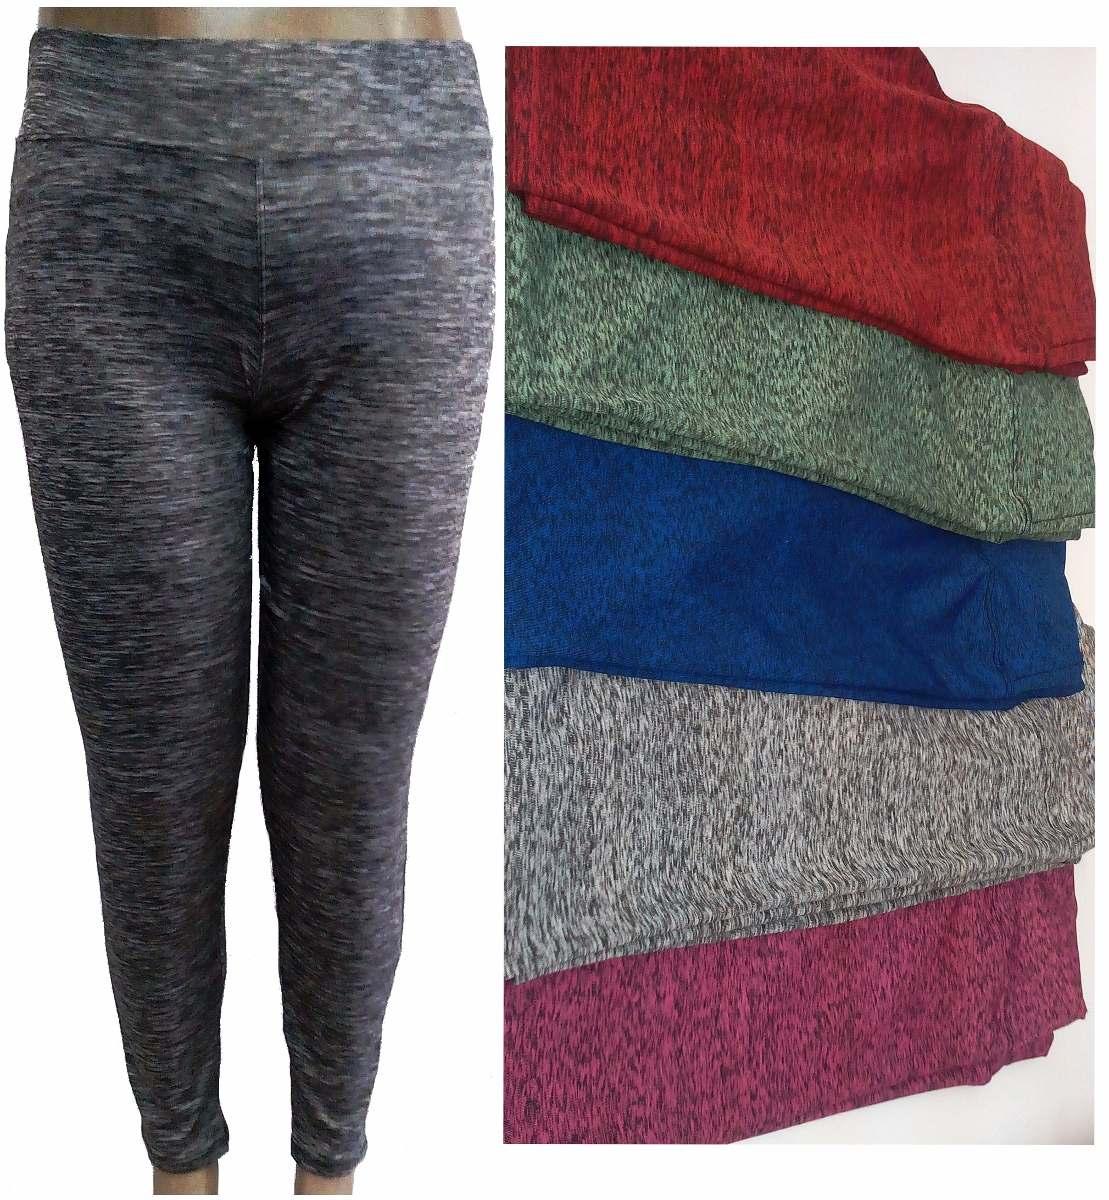 b447d026a 10 kit calça legging feminina rajada plus size ginástica. Carregando zoom.